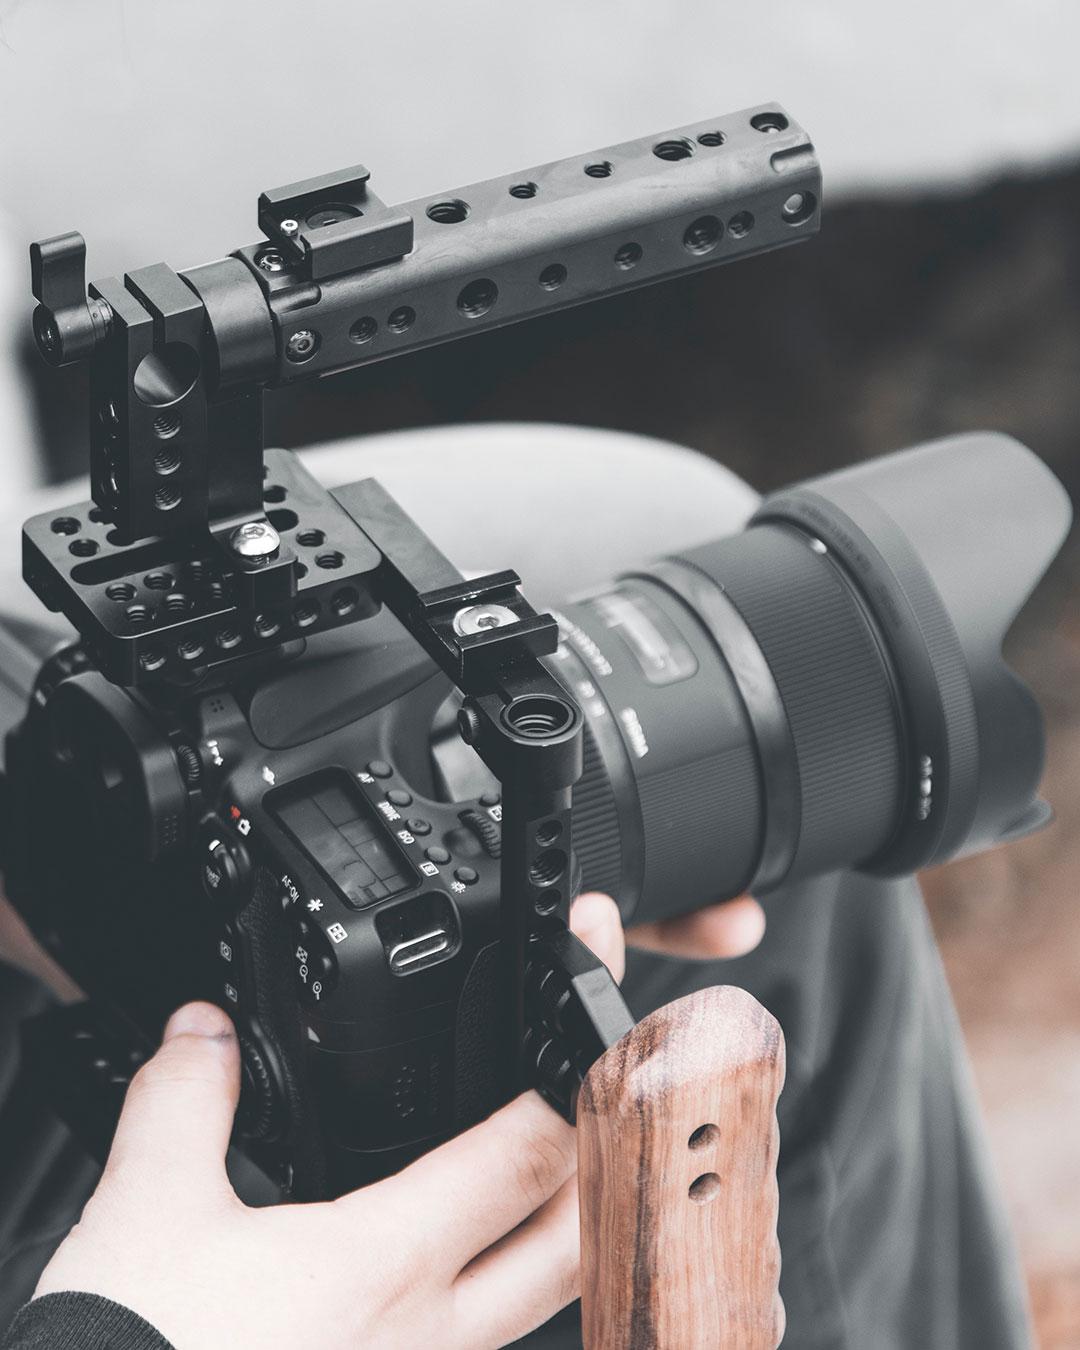 Film med DSLR-kamera